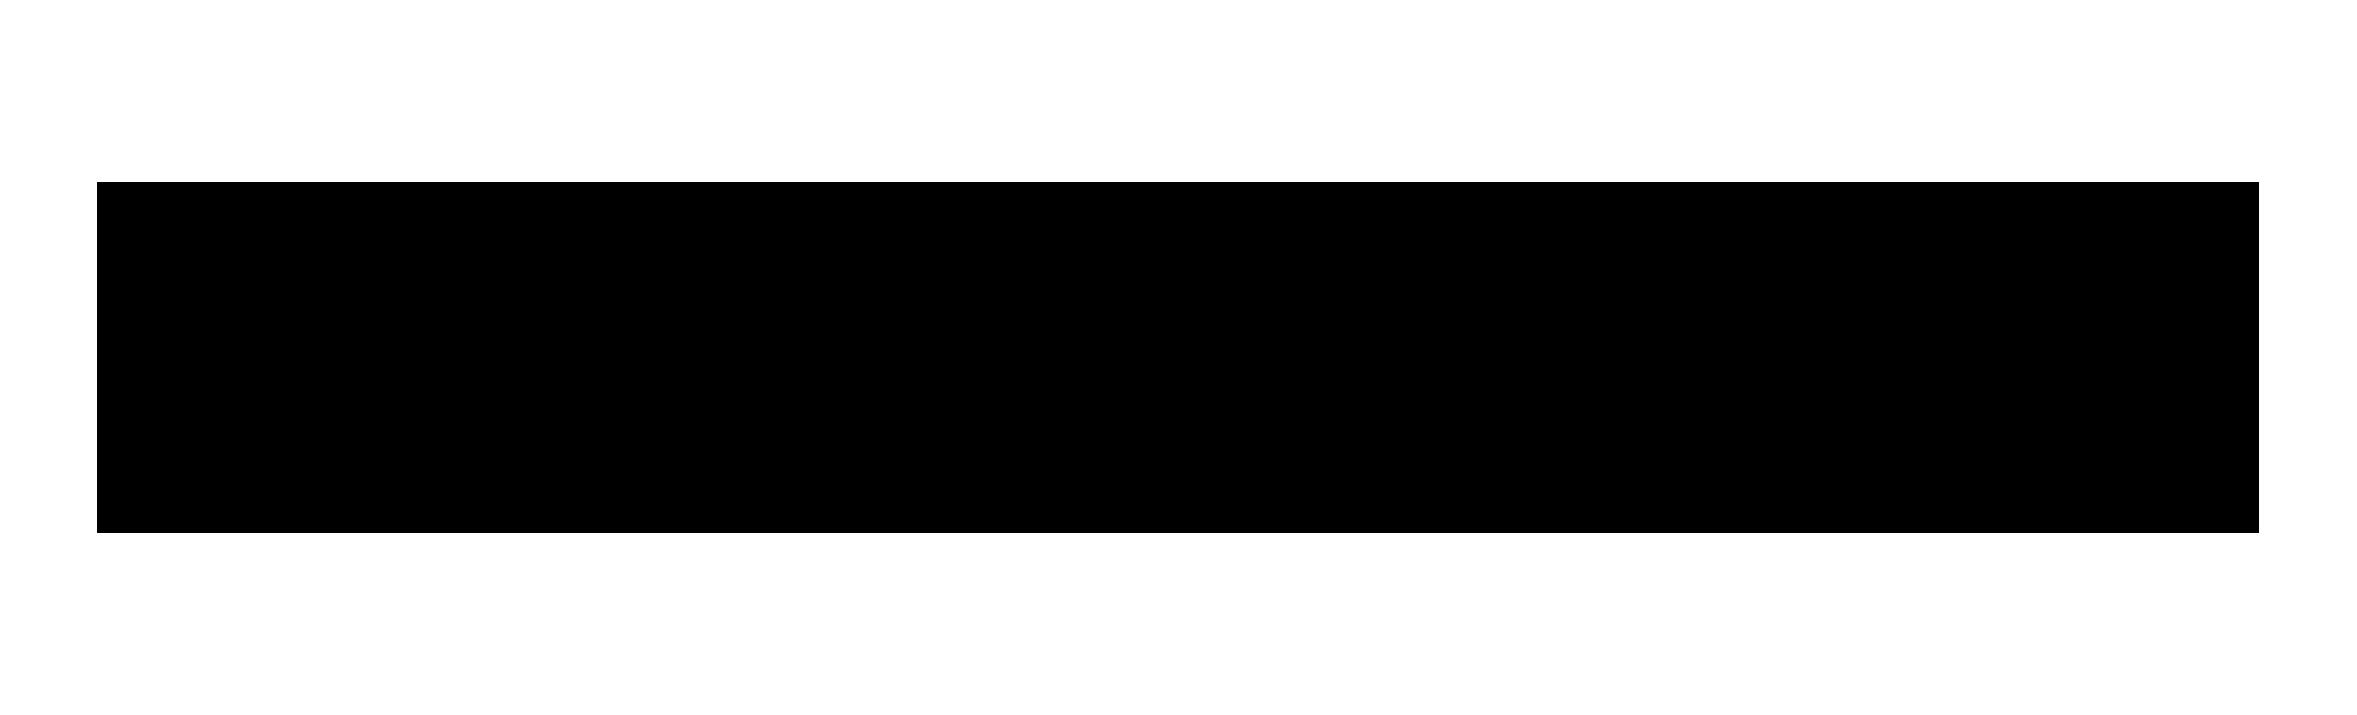 Just my look logo